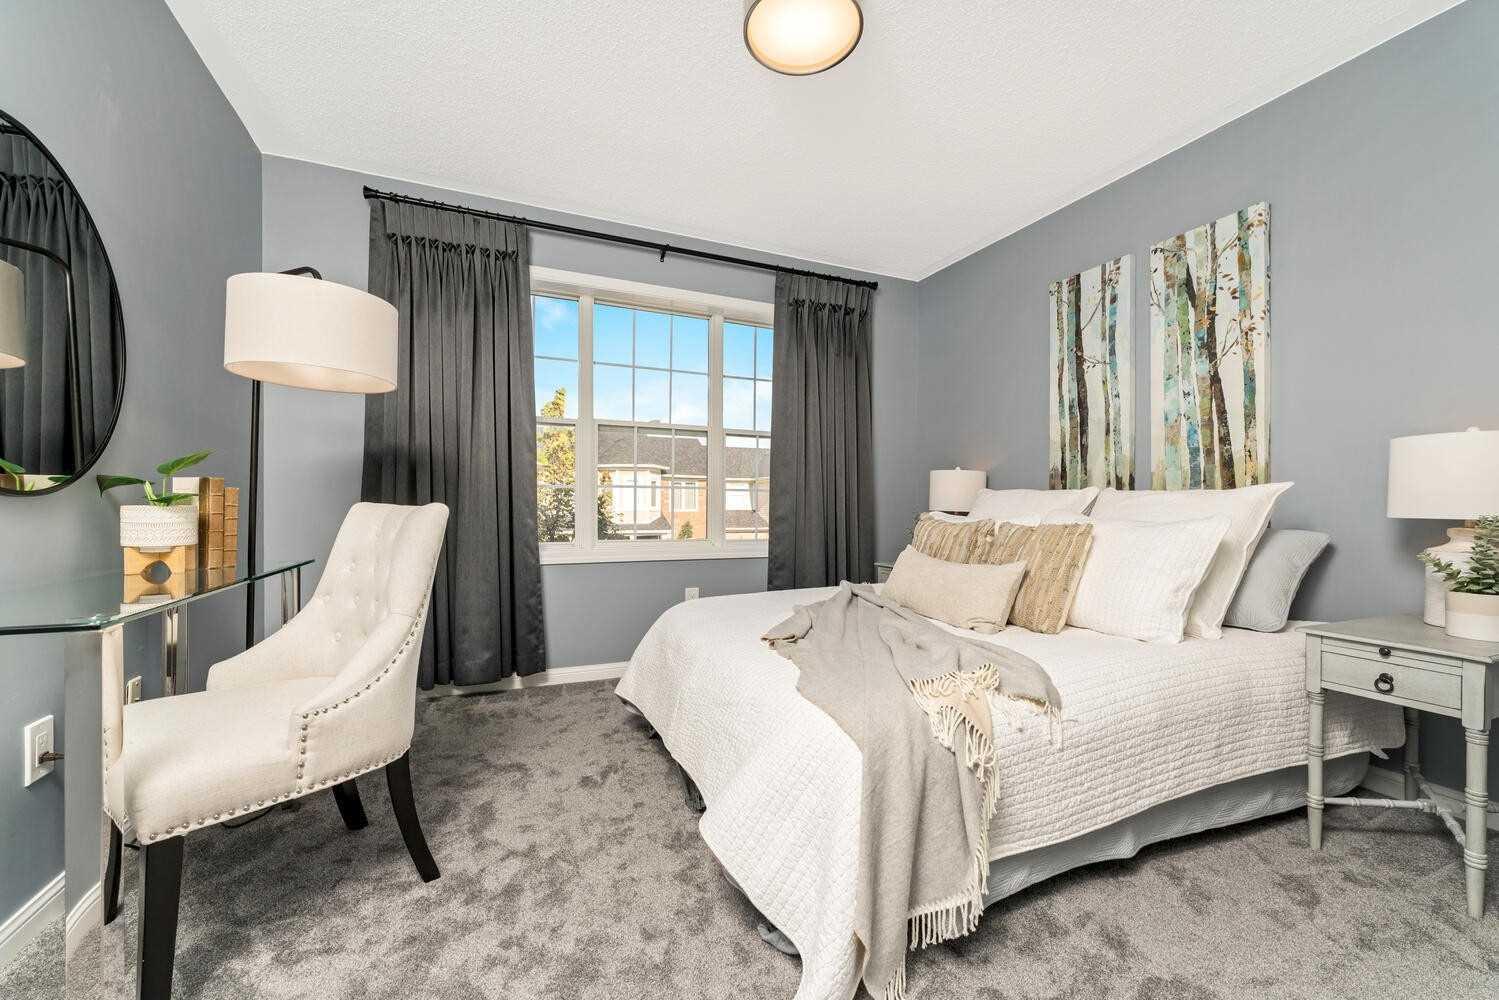 1030 Barclay Circ - Beaty Att/Row/Twnhouse for sale, 3 Bedrooms (W5400435) - #18